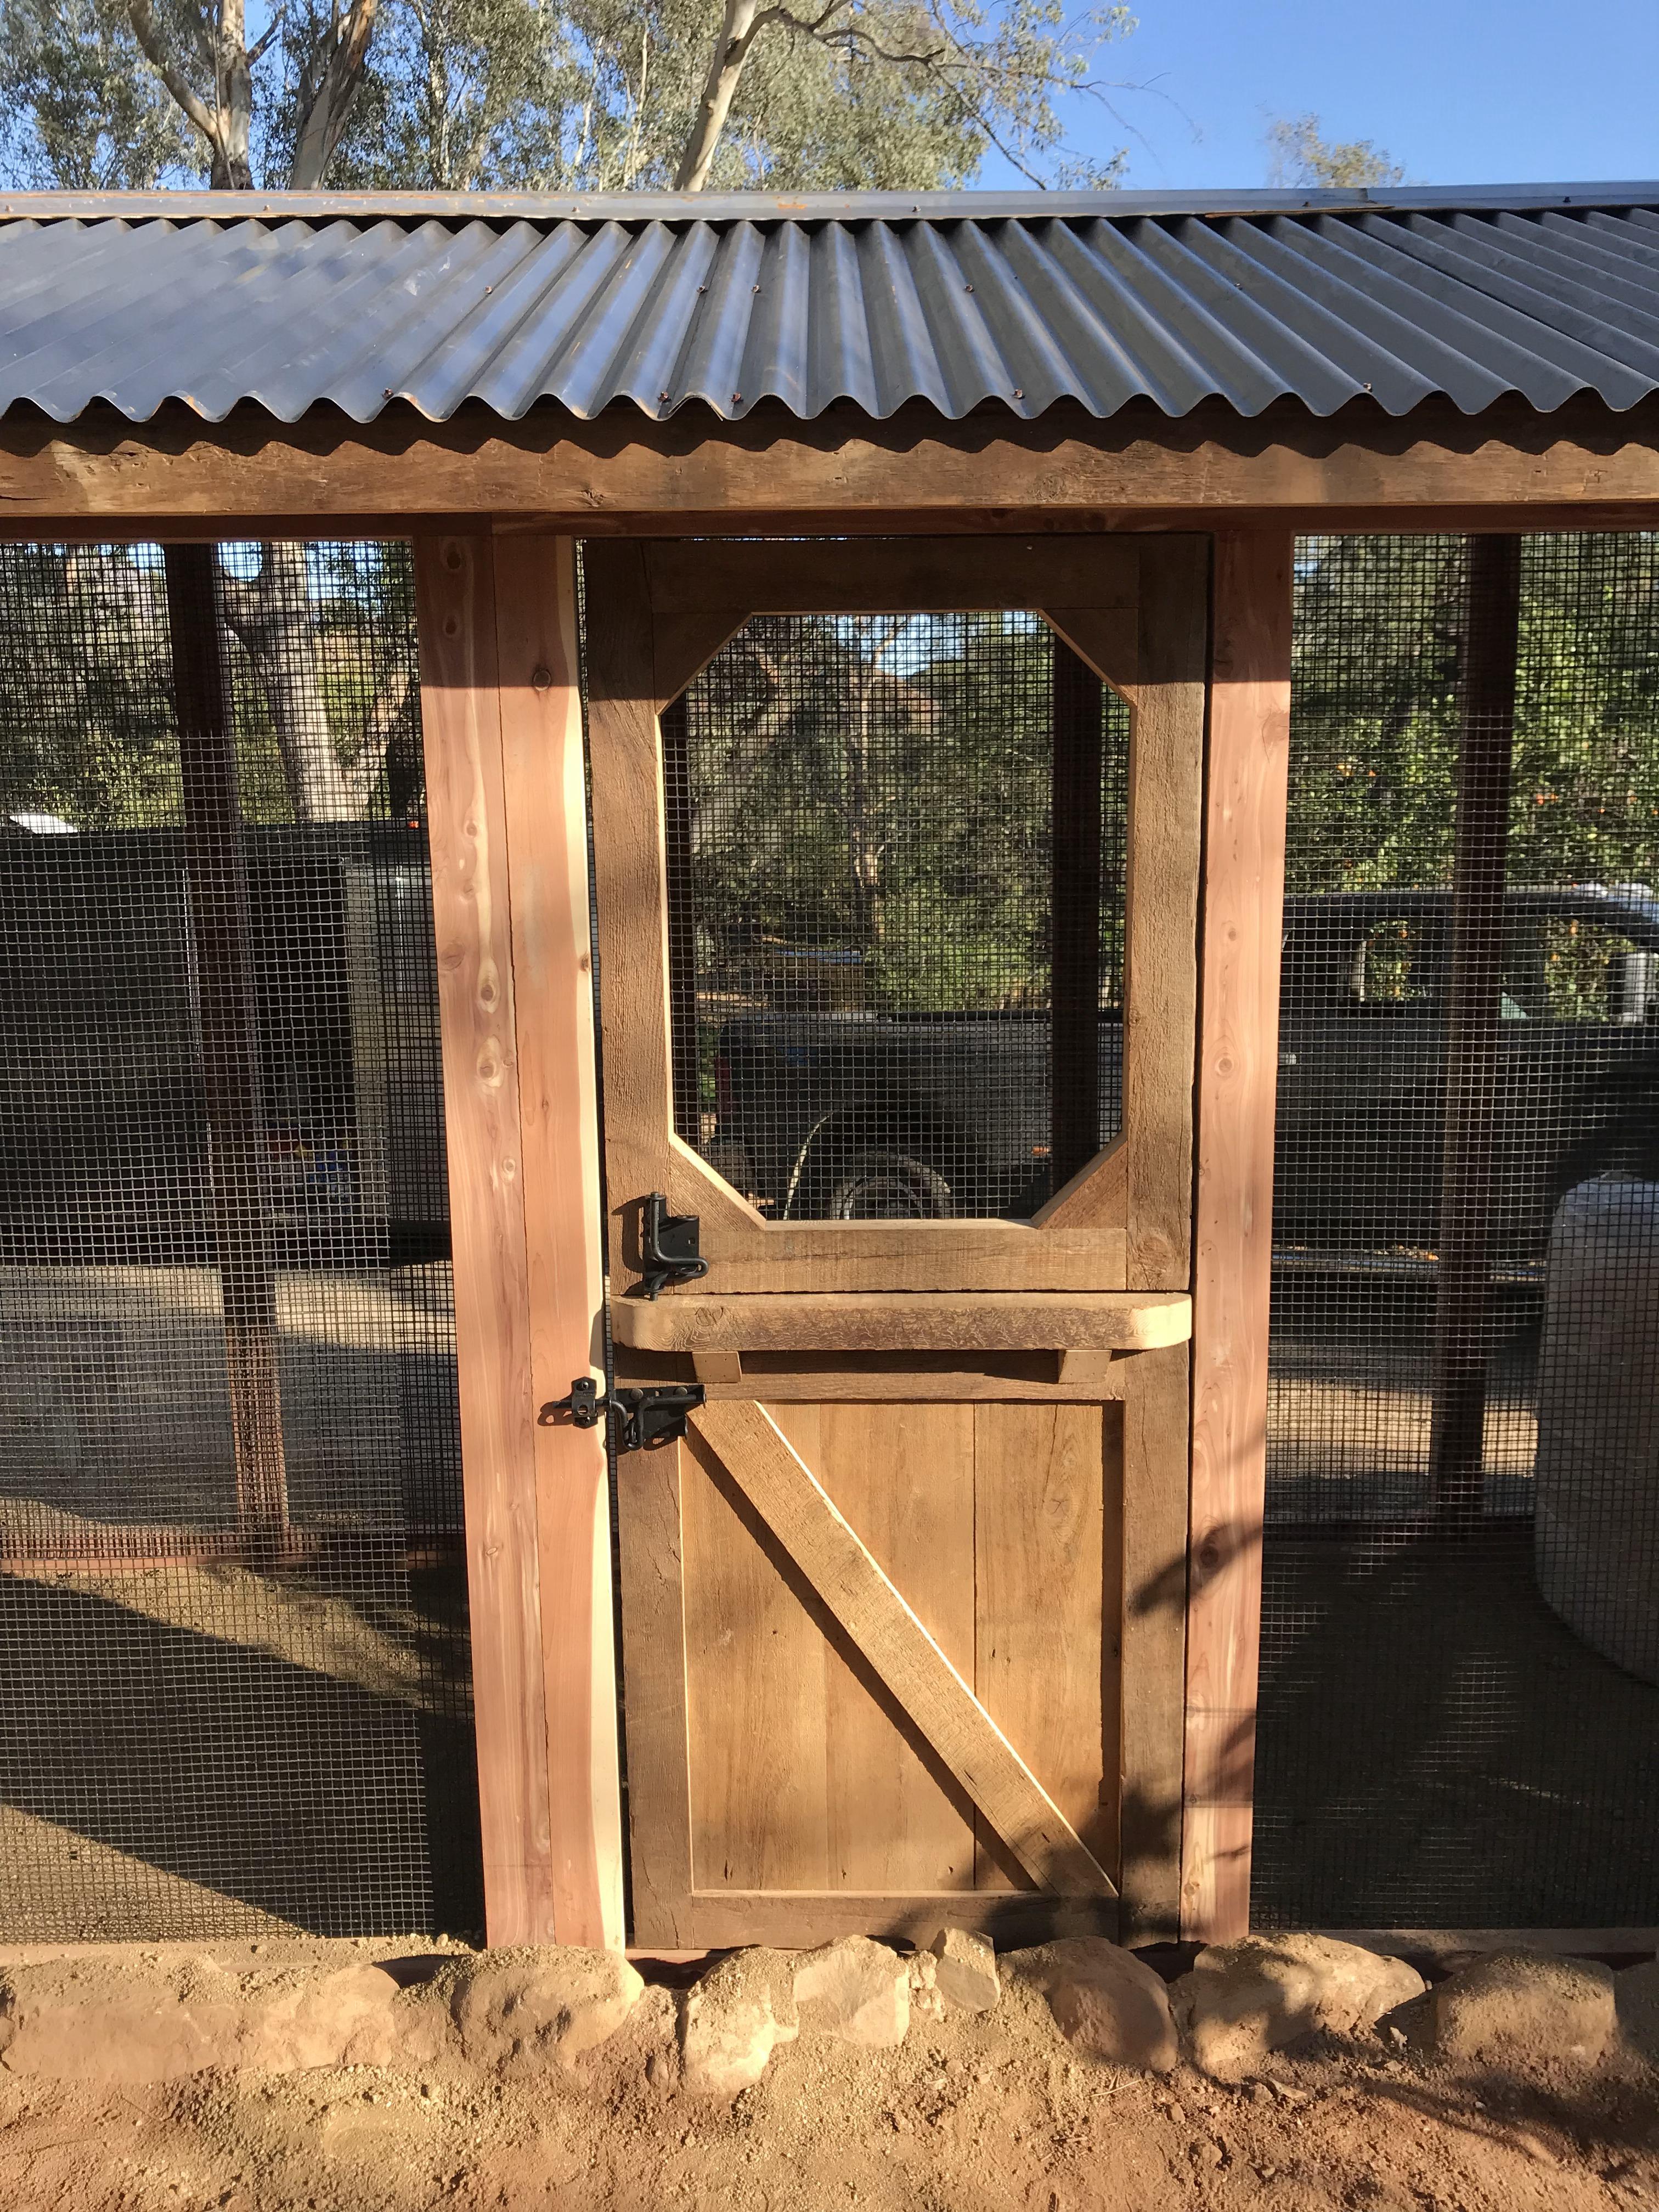 Red cedar reclaimed barn wood in Ojai, CA